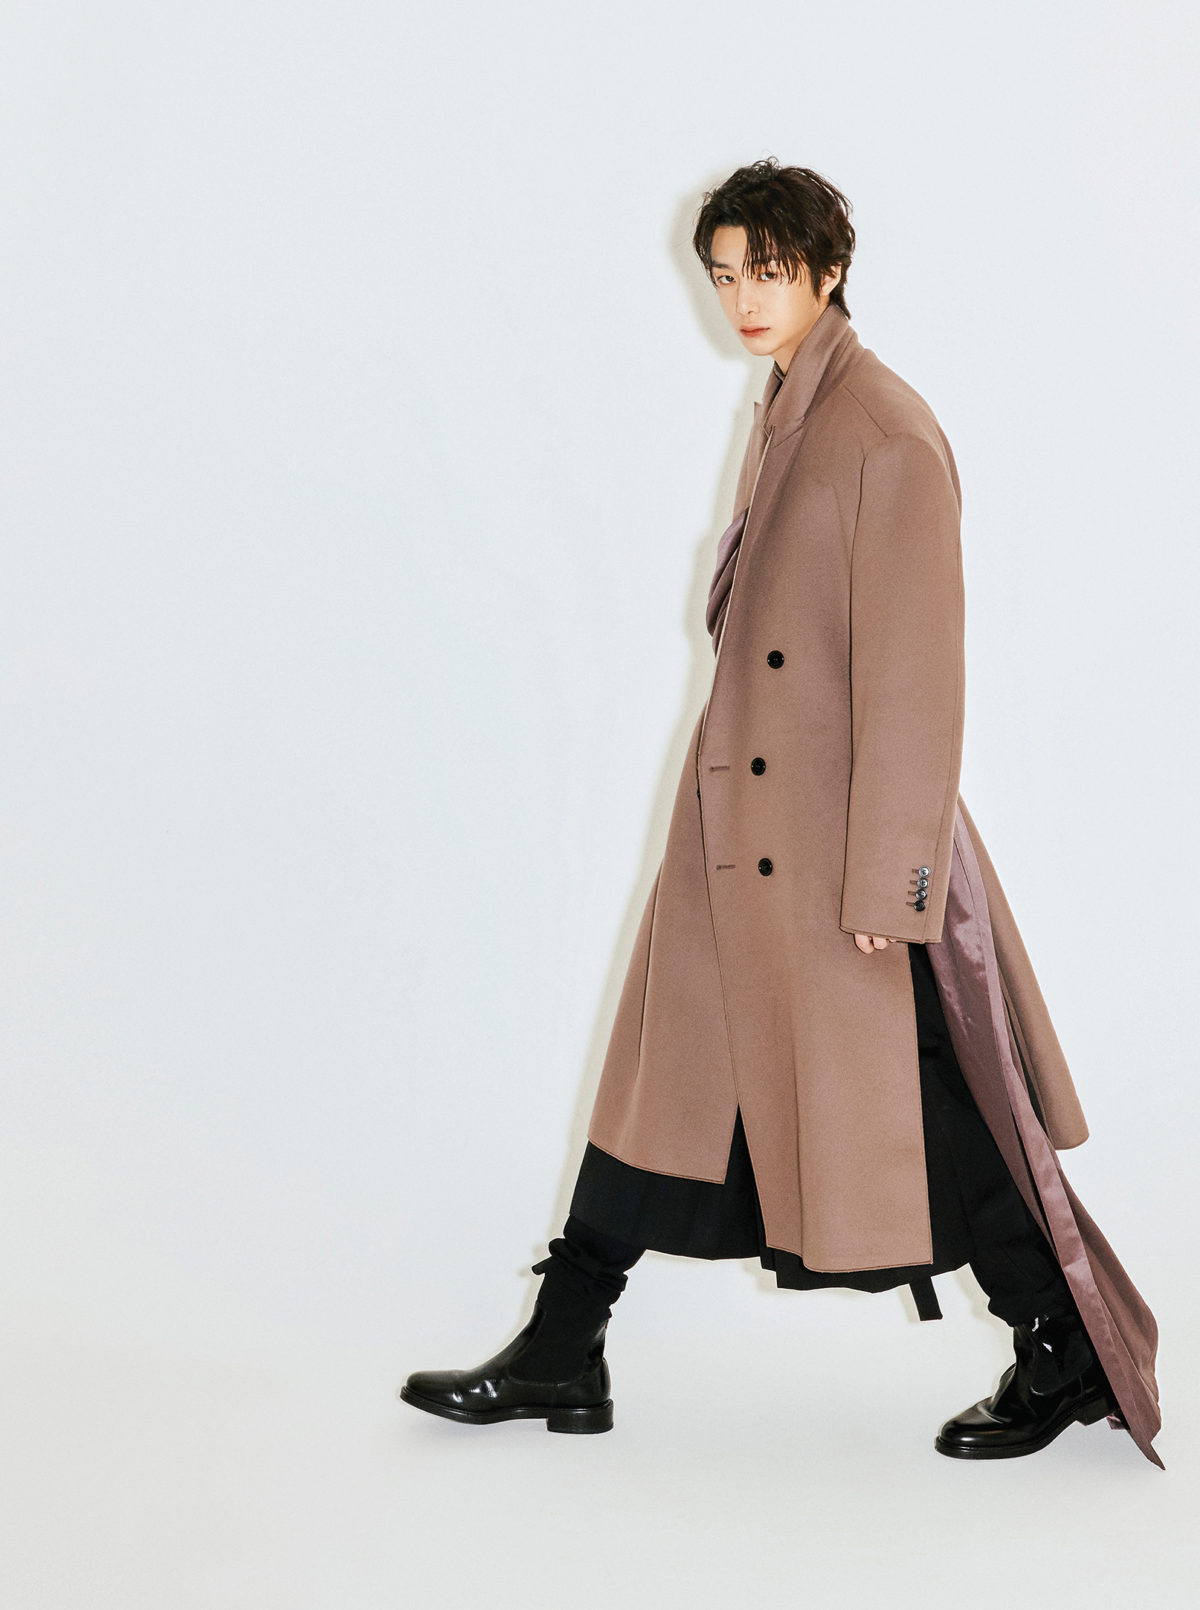 style_5dae8ca312c27-1200x1610